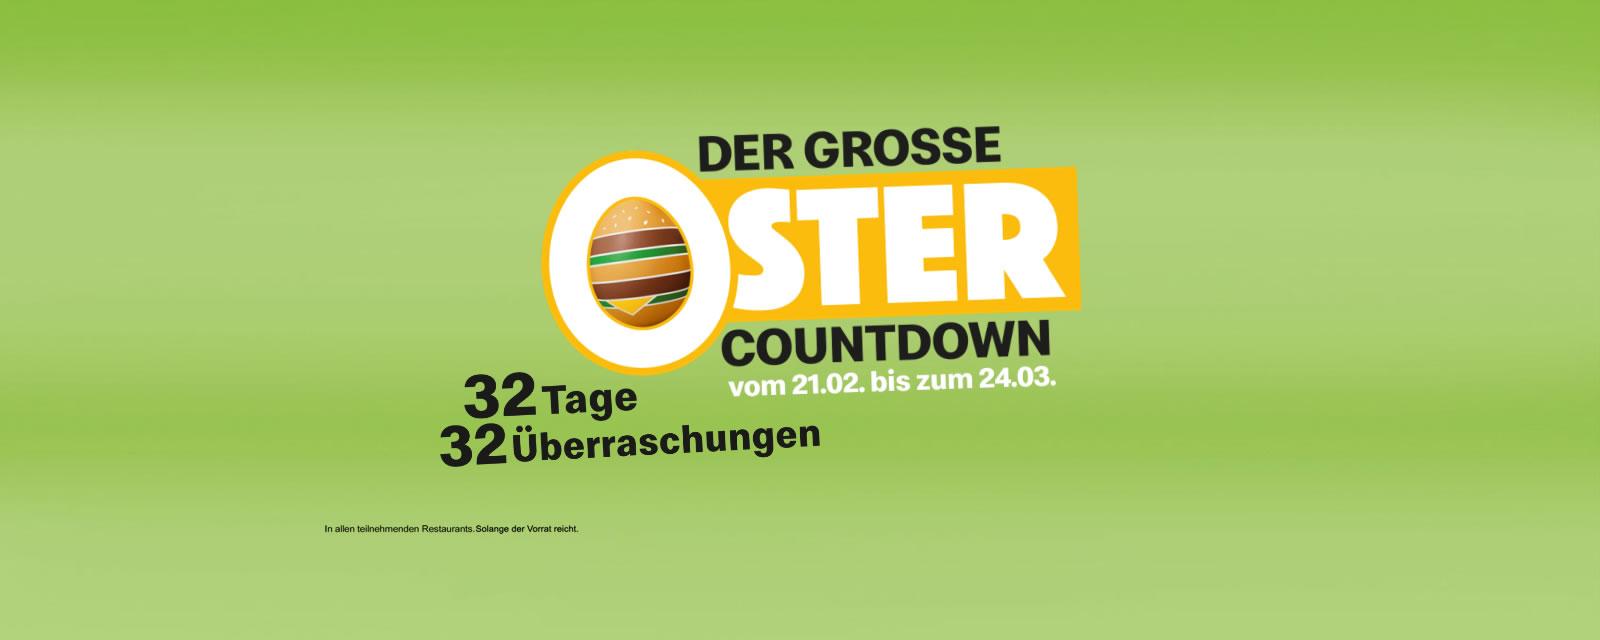 Der Große Oster Countdown!